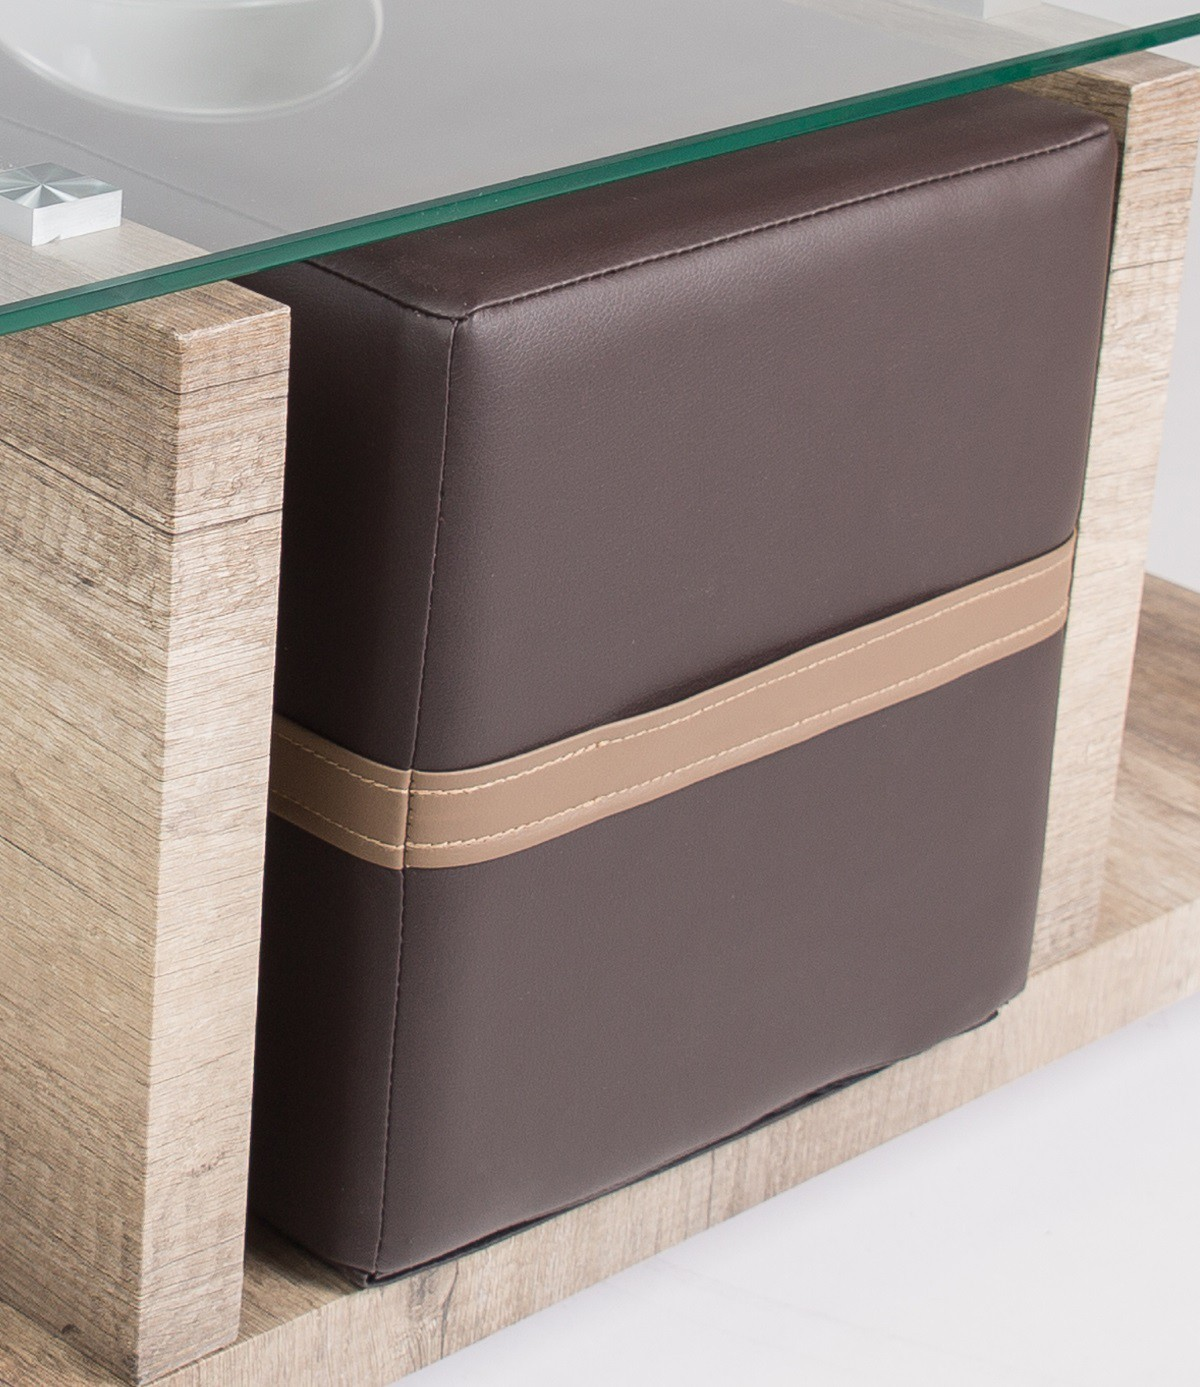 Table basse avec pouf en bois